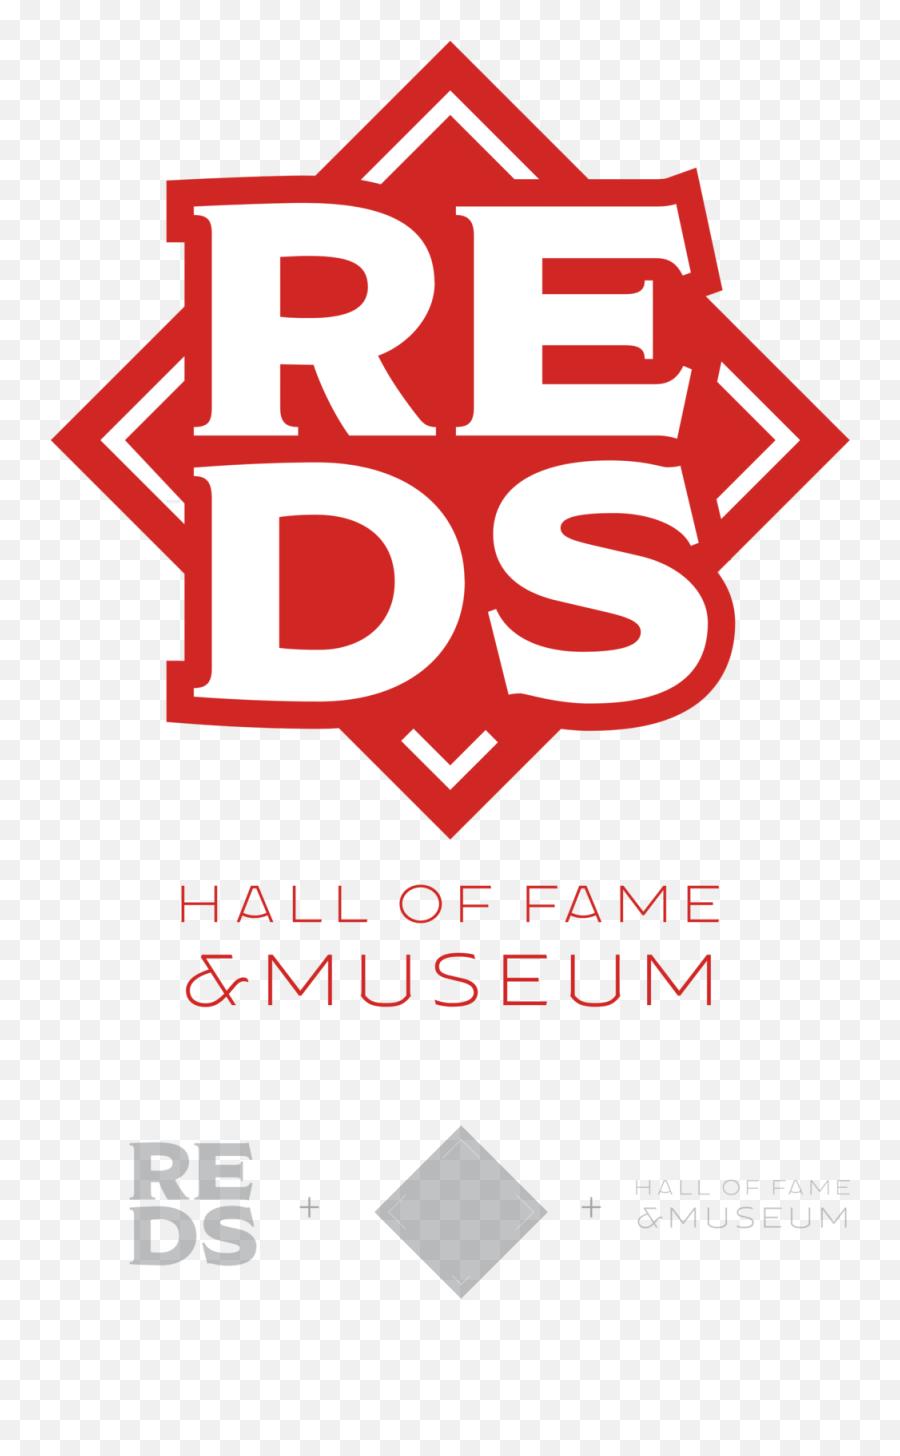 Reds Hall Of Fame And Museum Lauren - Vertical Png,Cincinnati Reds Logo Png